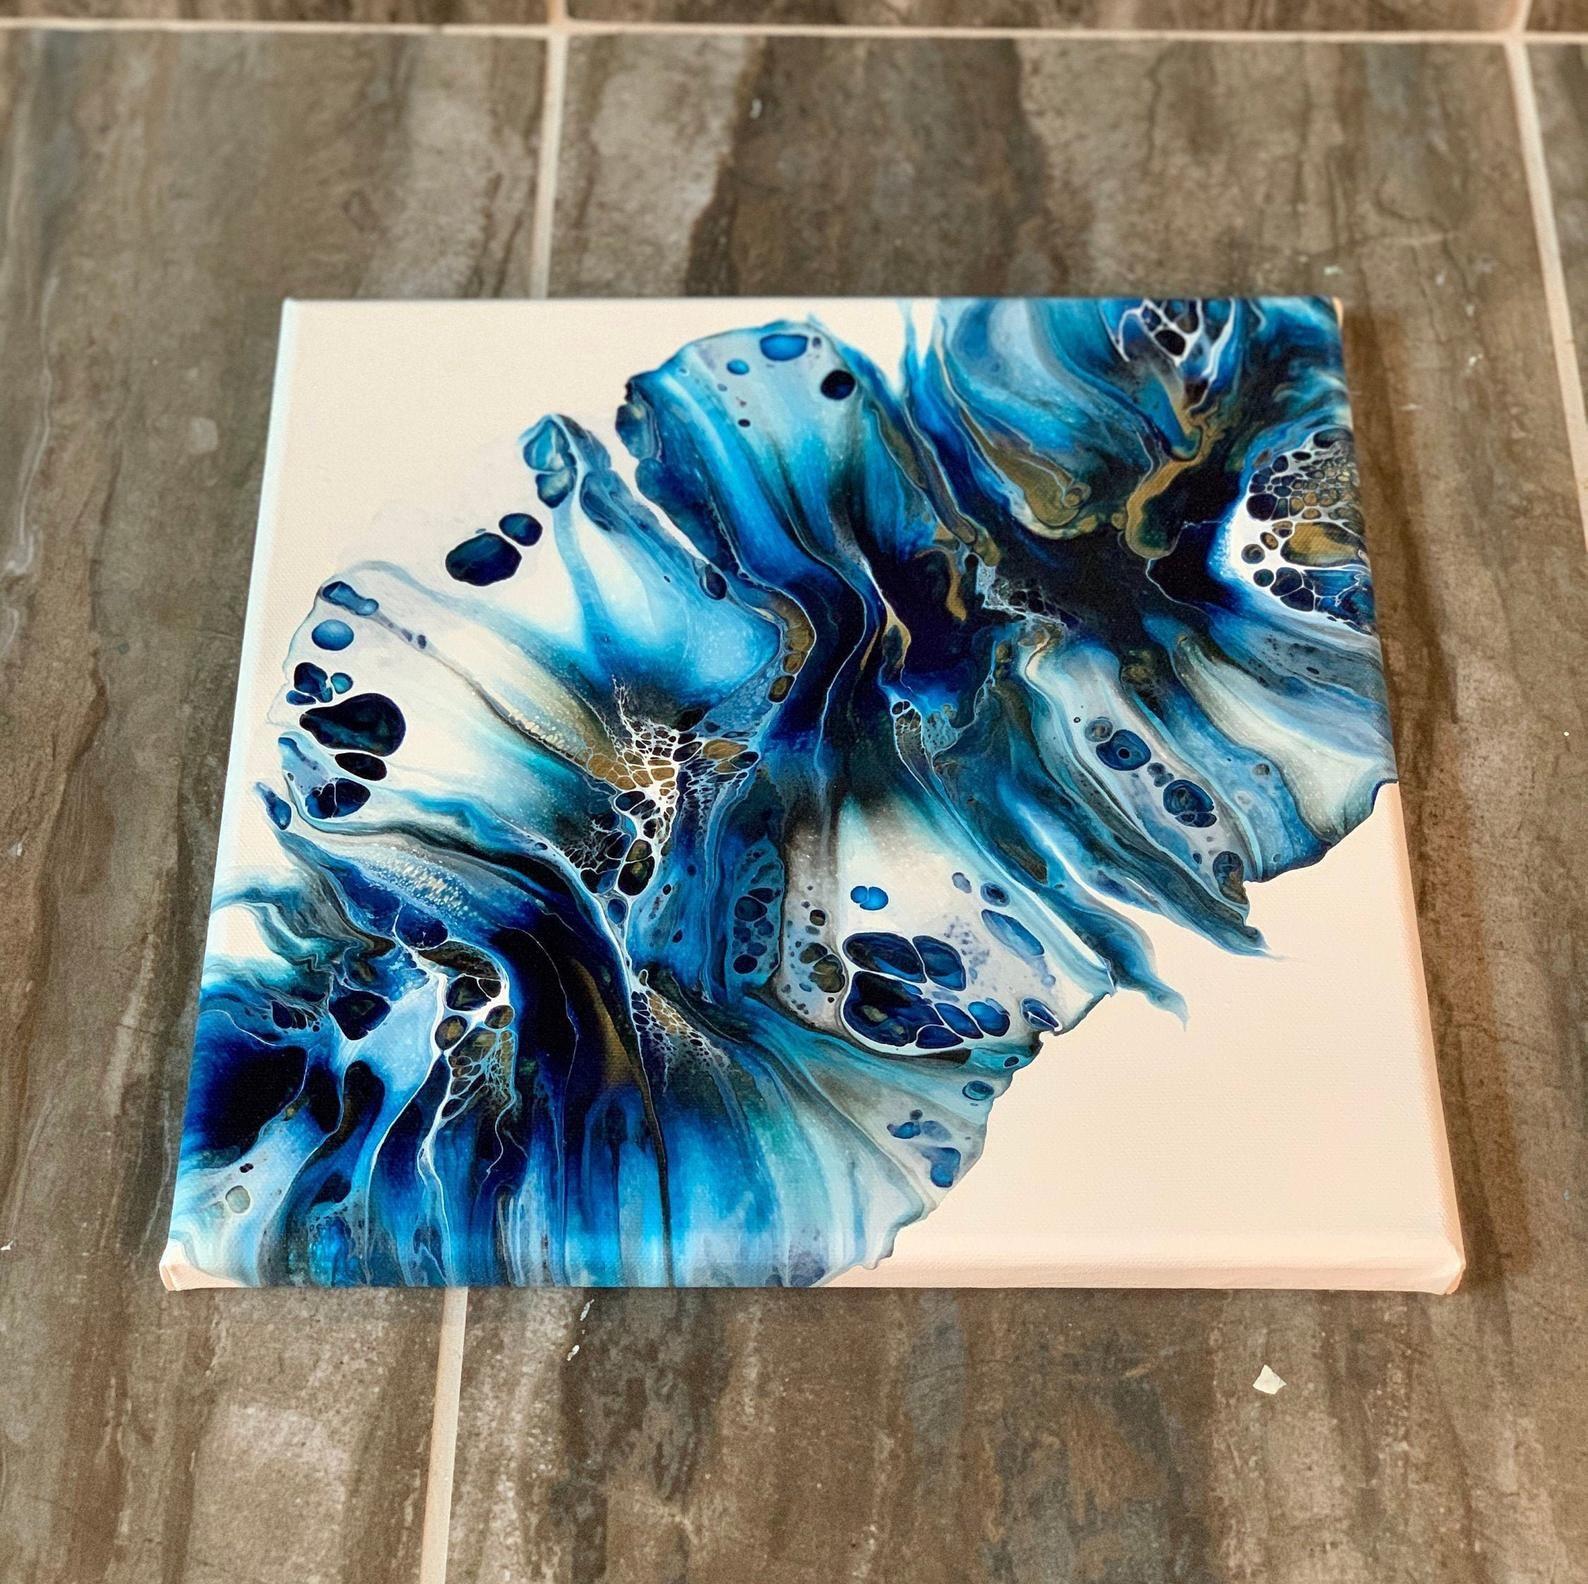 Wall Art Fluid Art Pour Painting 12 x 12 Canvas Acrylic Abstract